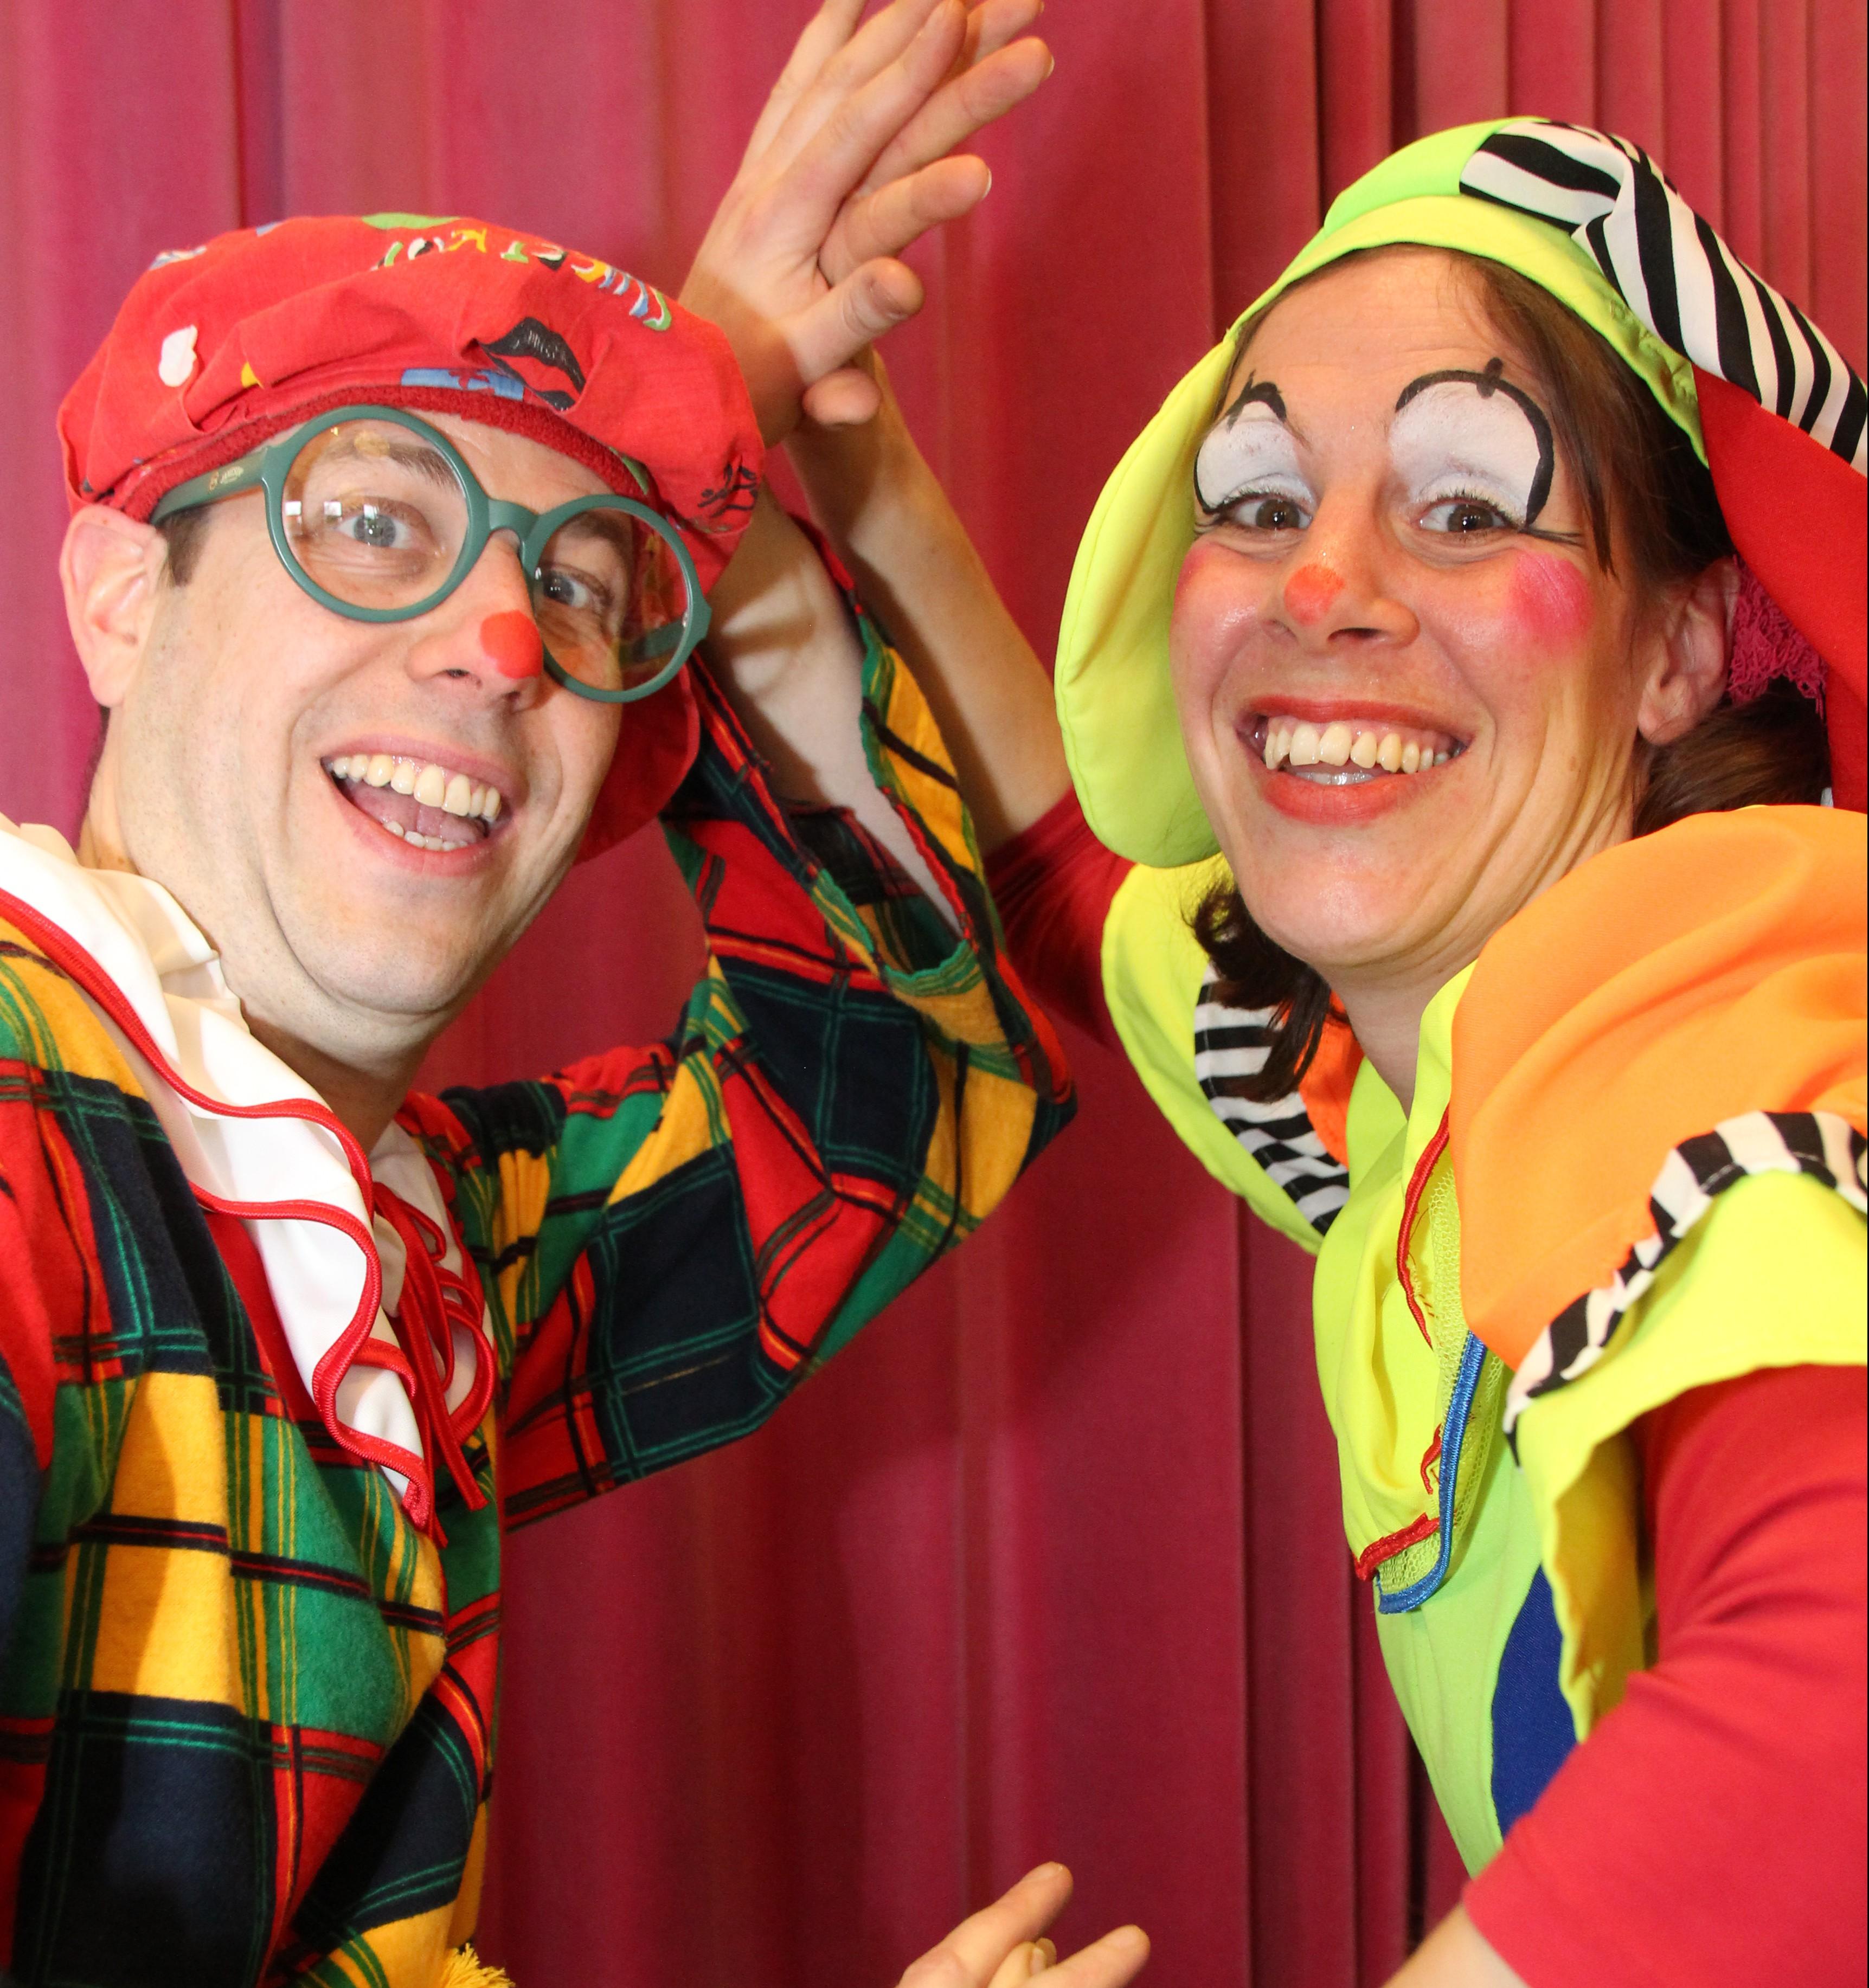 Zino en Baliekes Foliekes show